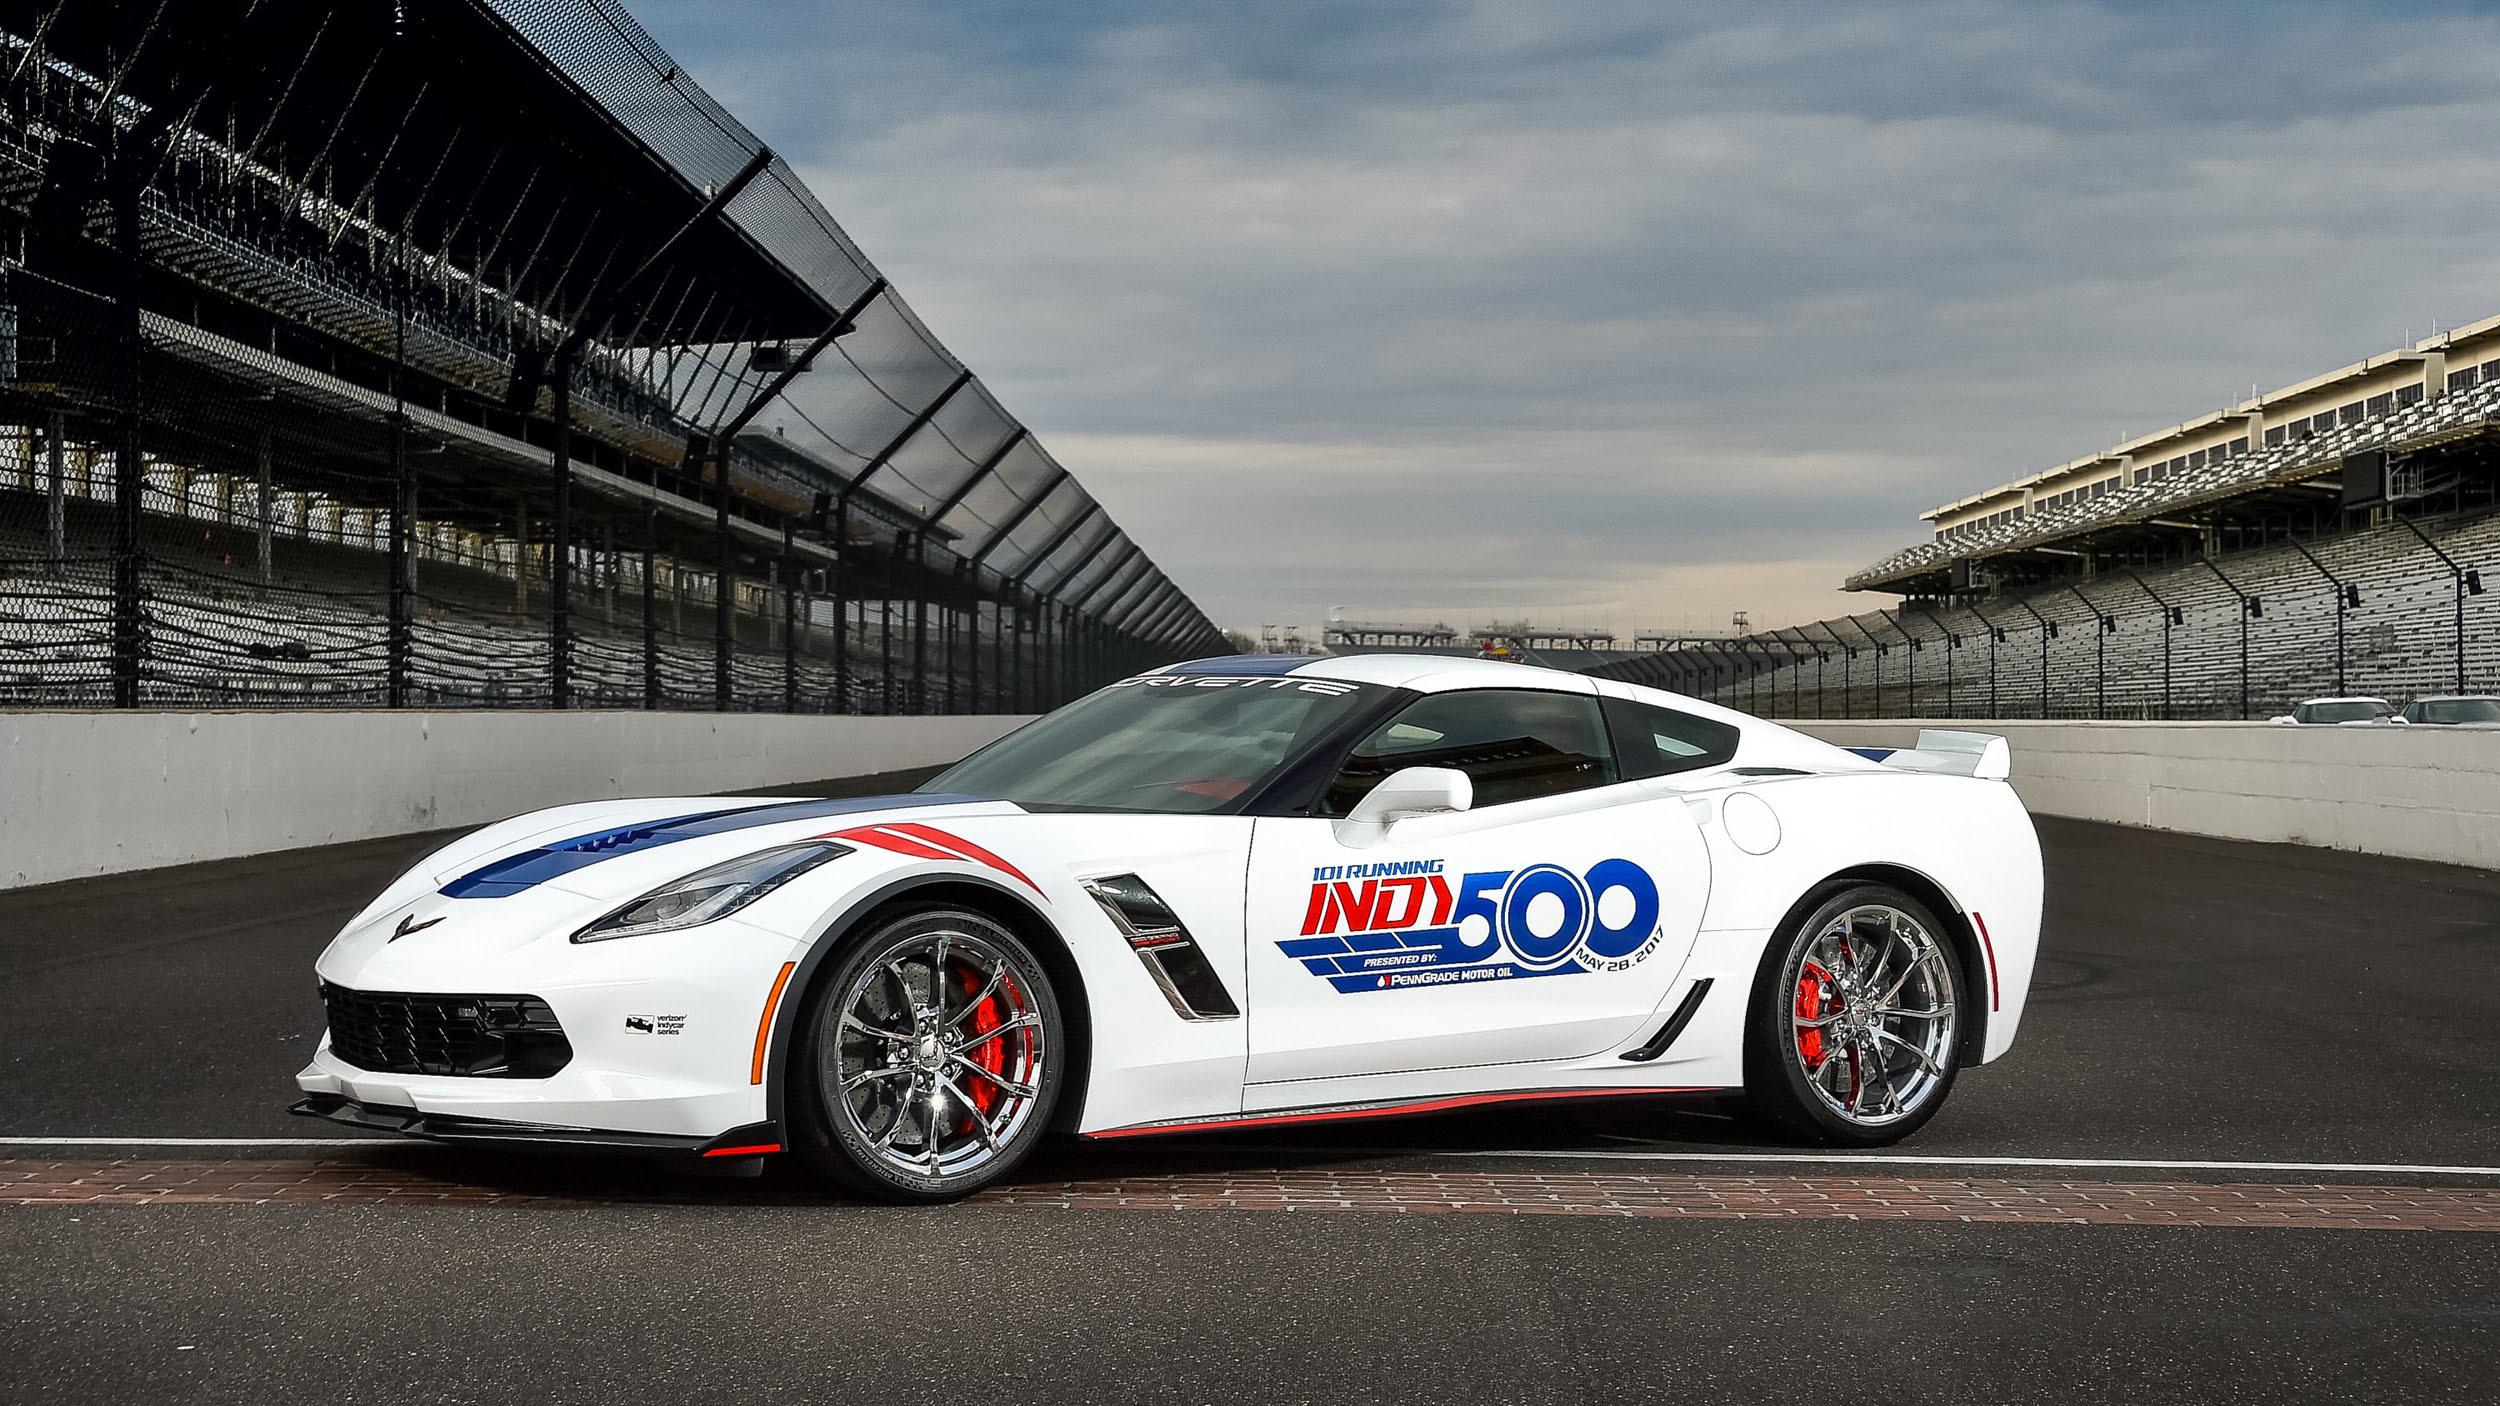 Chevrolet Corvette Grand Sport pace car Indy 500 (1)